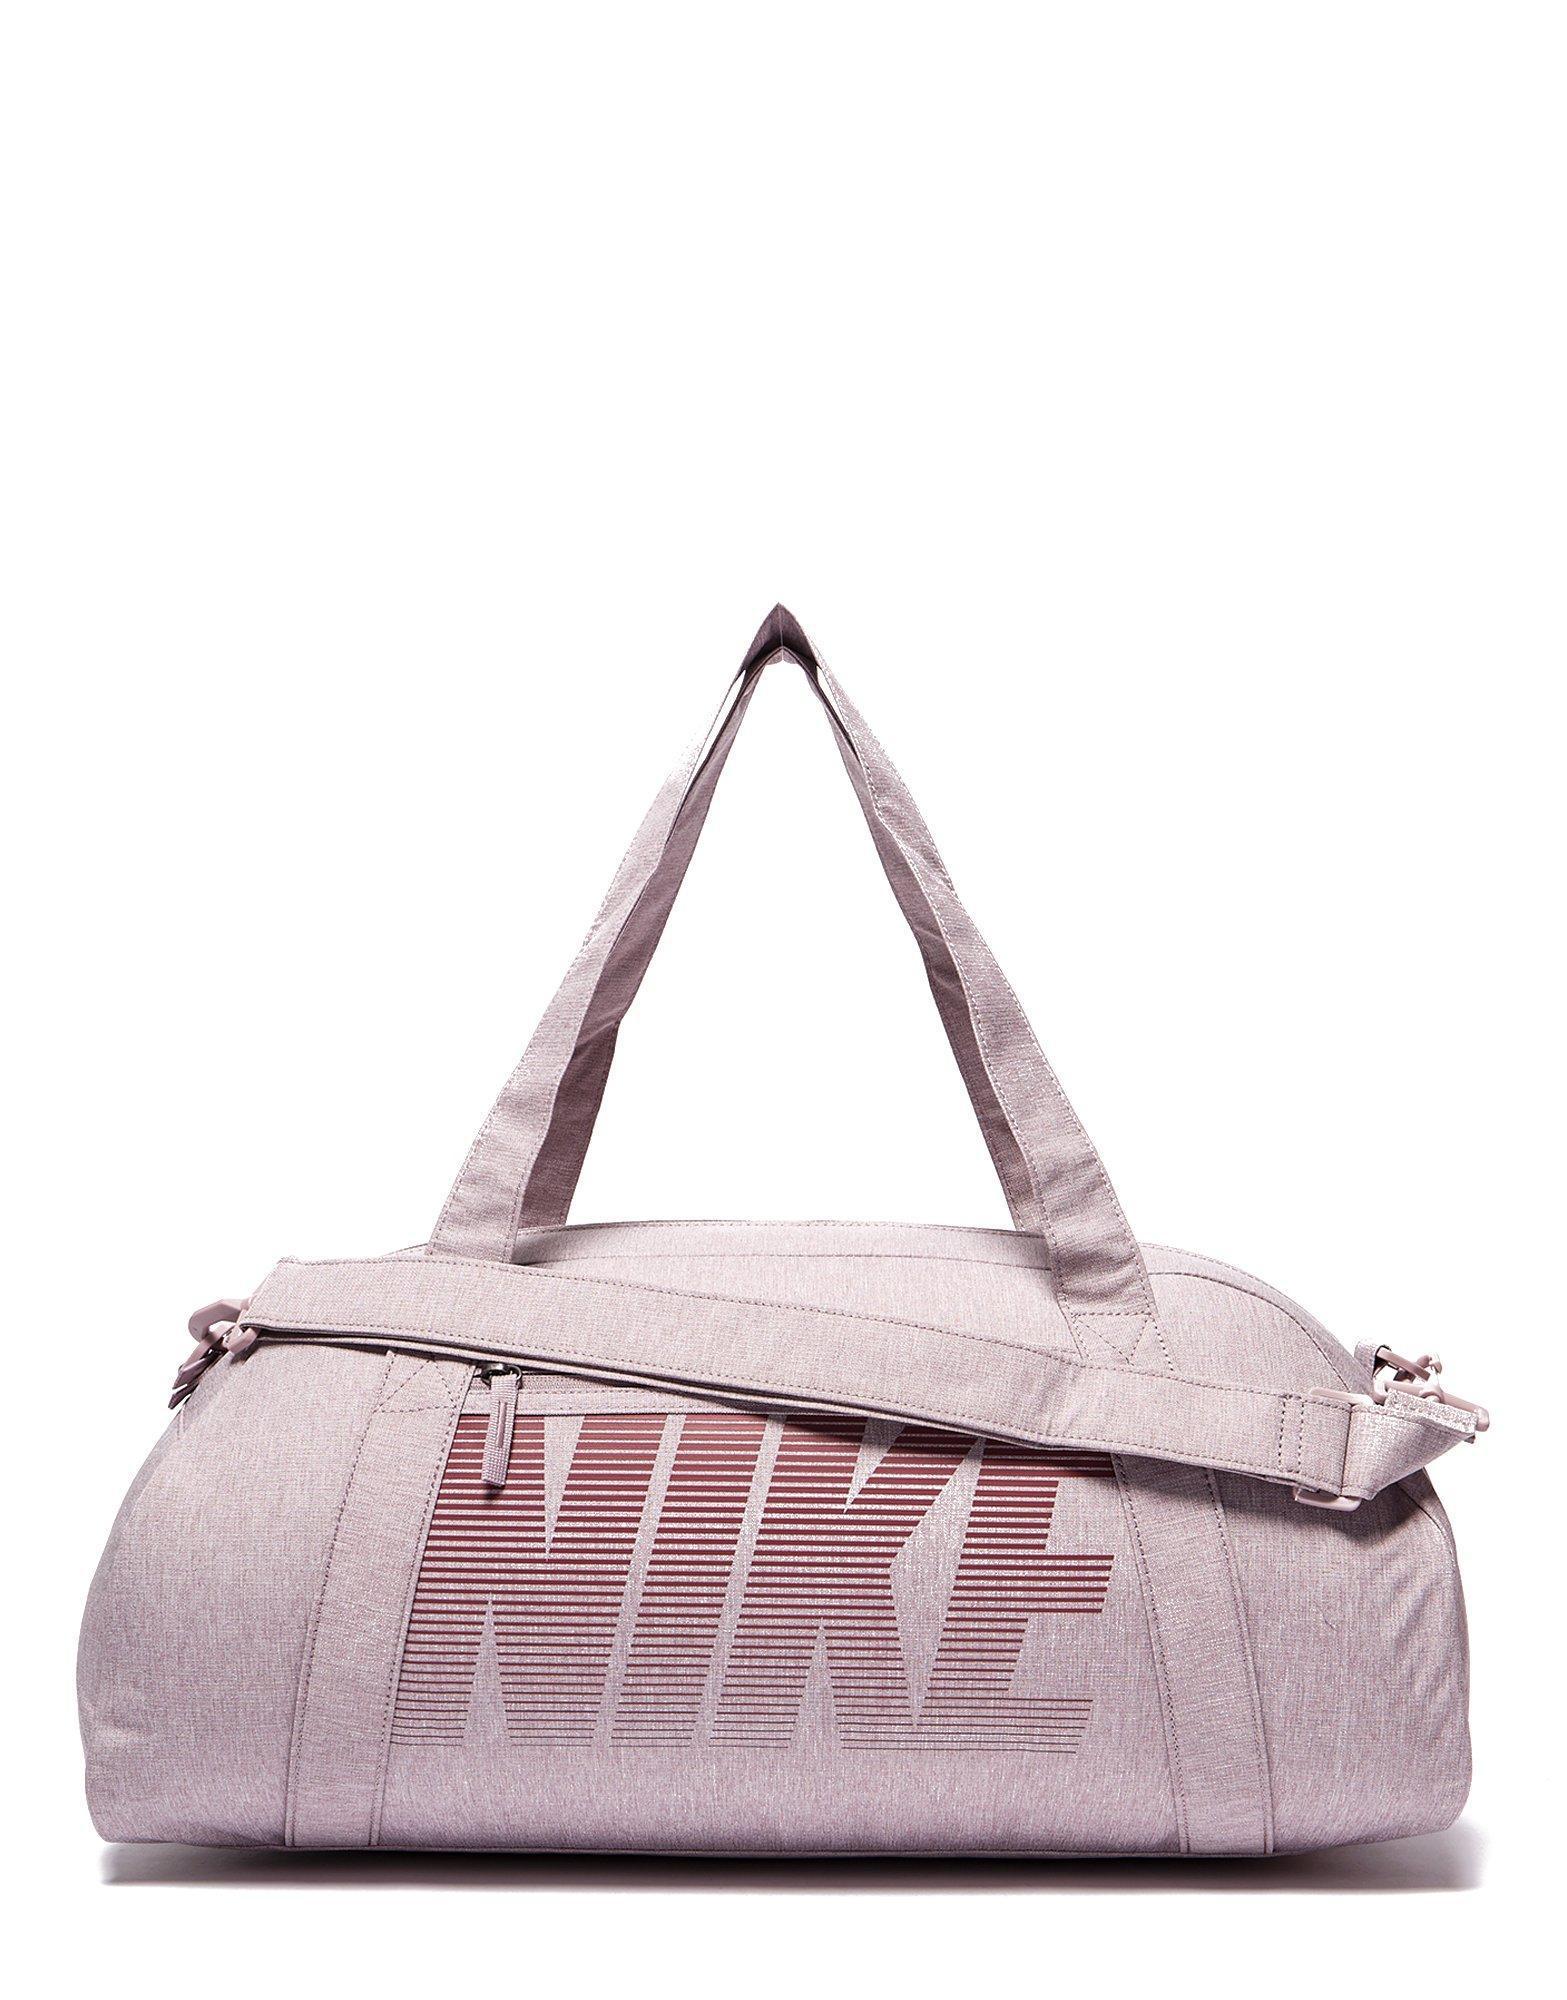 a6e28637d4b1 Lyst - Nike Gym Club Training Duffle Bag in Pink for Men